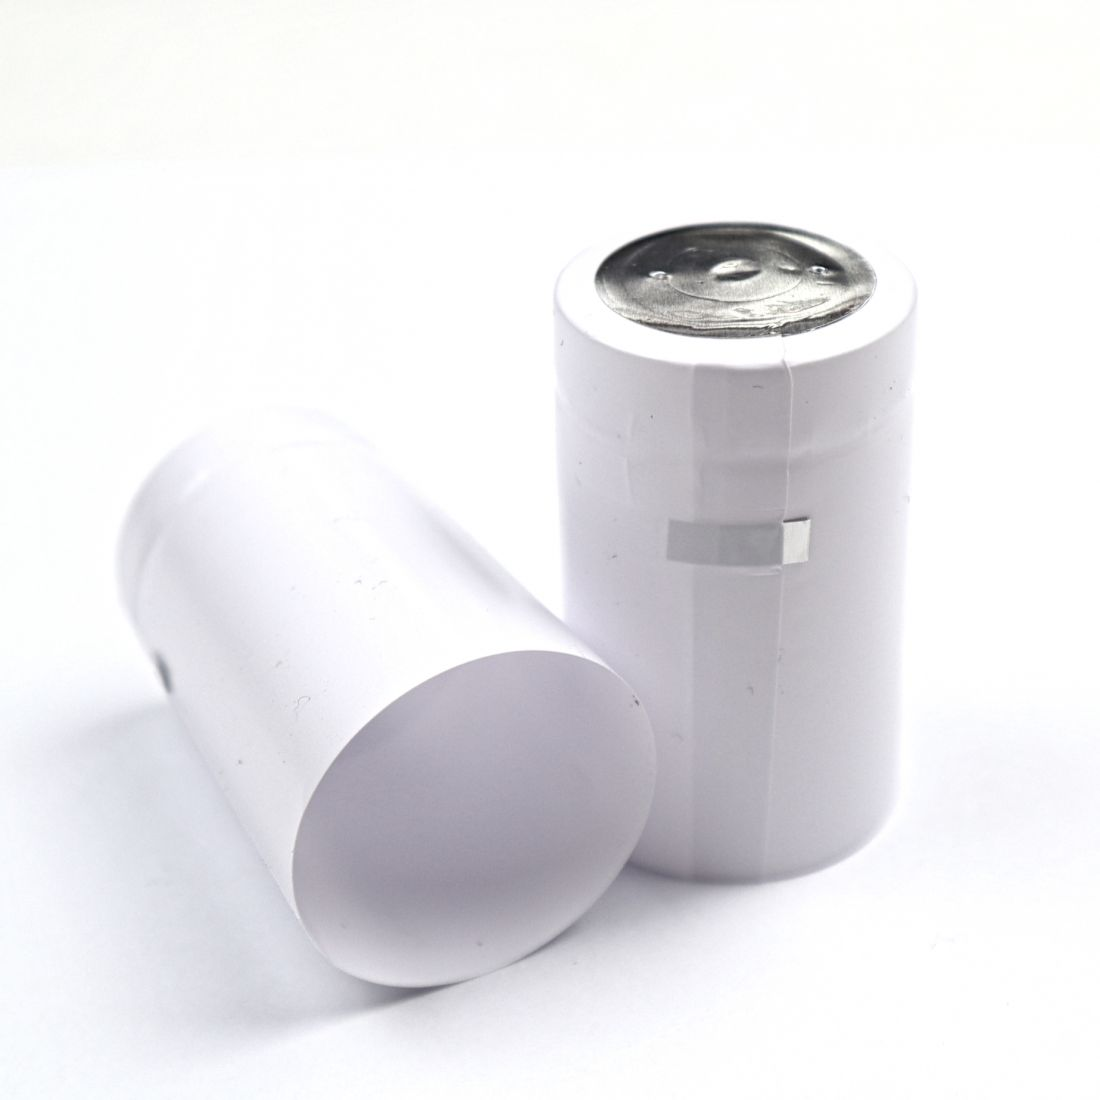 Термоусадочный колпачок белый 50х30 мм, (10 шт)